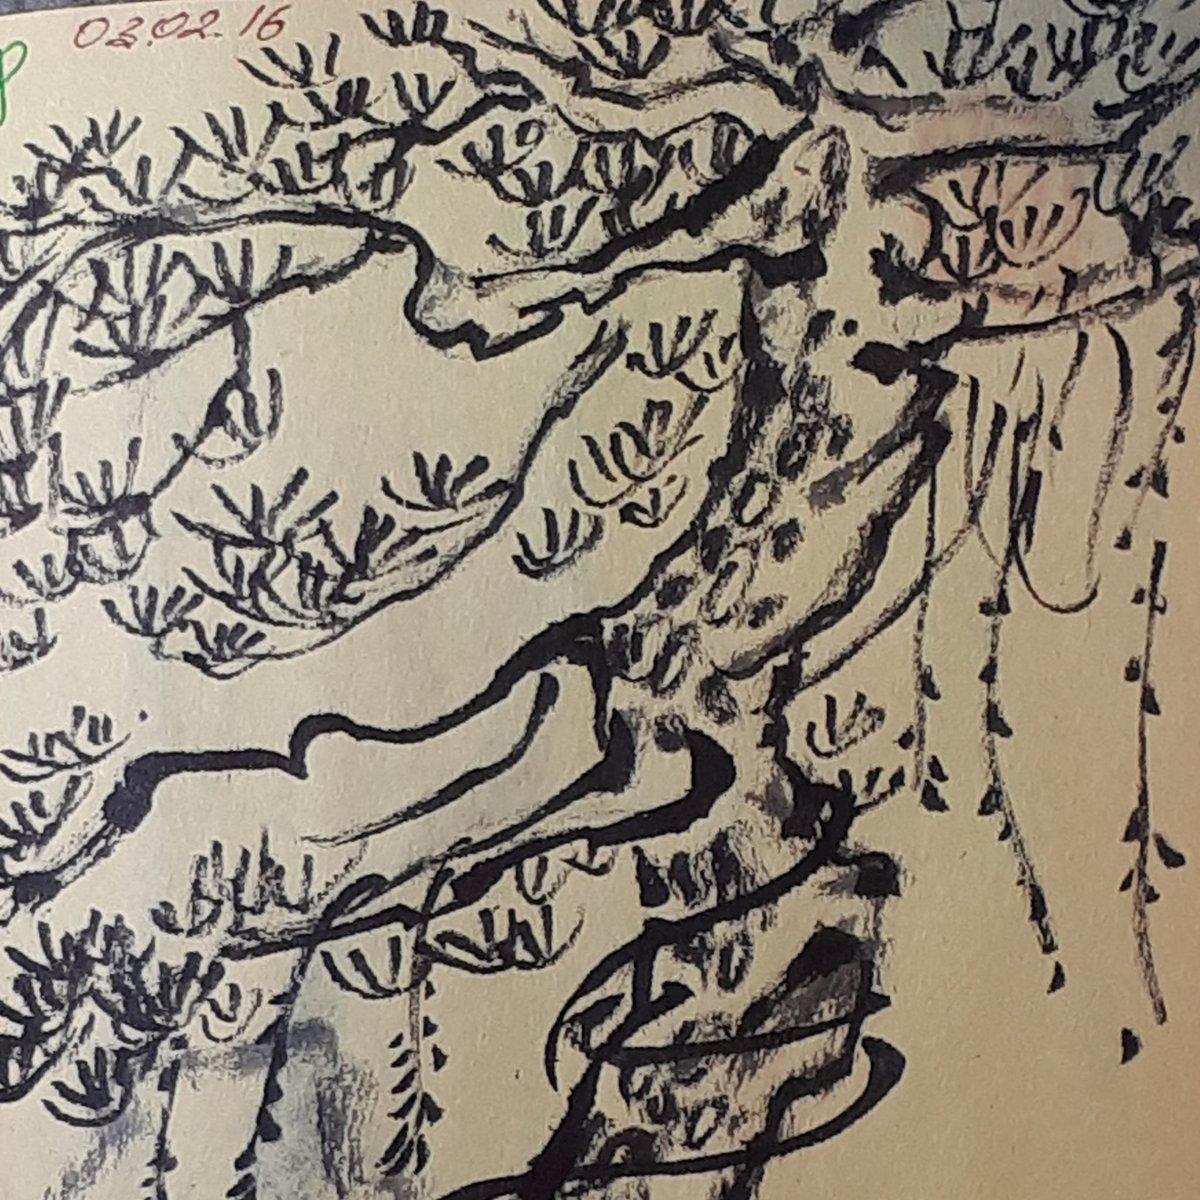 Monday morning #sketchbook details! 👀 Beautiful bonsai 🎨🍃 #sketchbooking #sketch #sketch_daily #drawing #travel #dailyinspiration #dailyart #midweekmotivation #treelovers #nature #weekend #ink #tbt #mondayblues